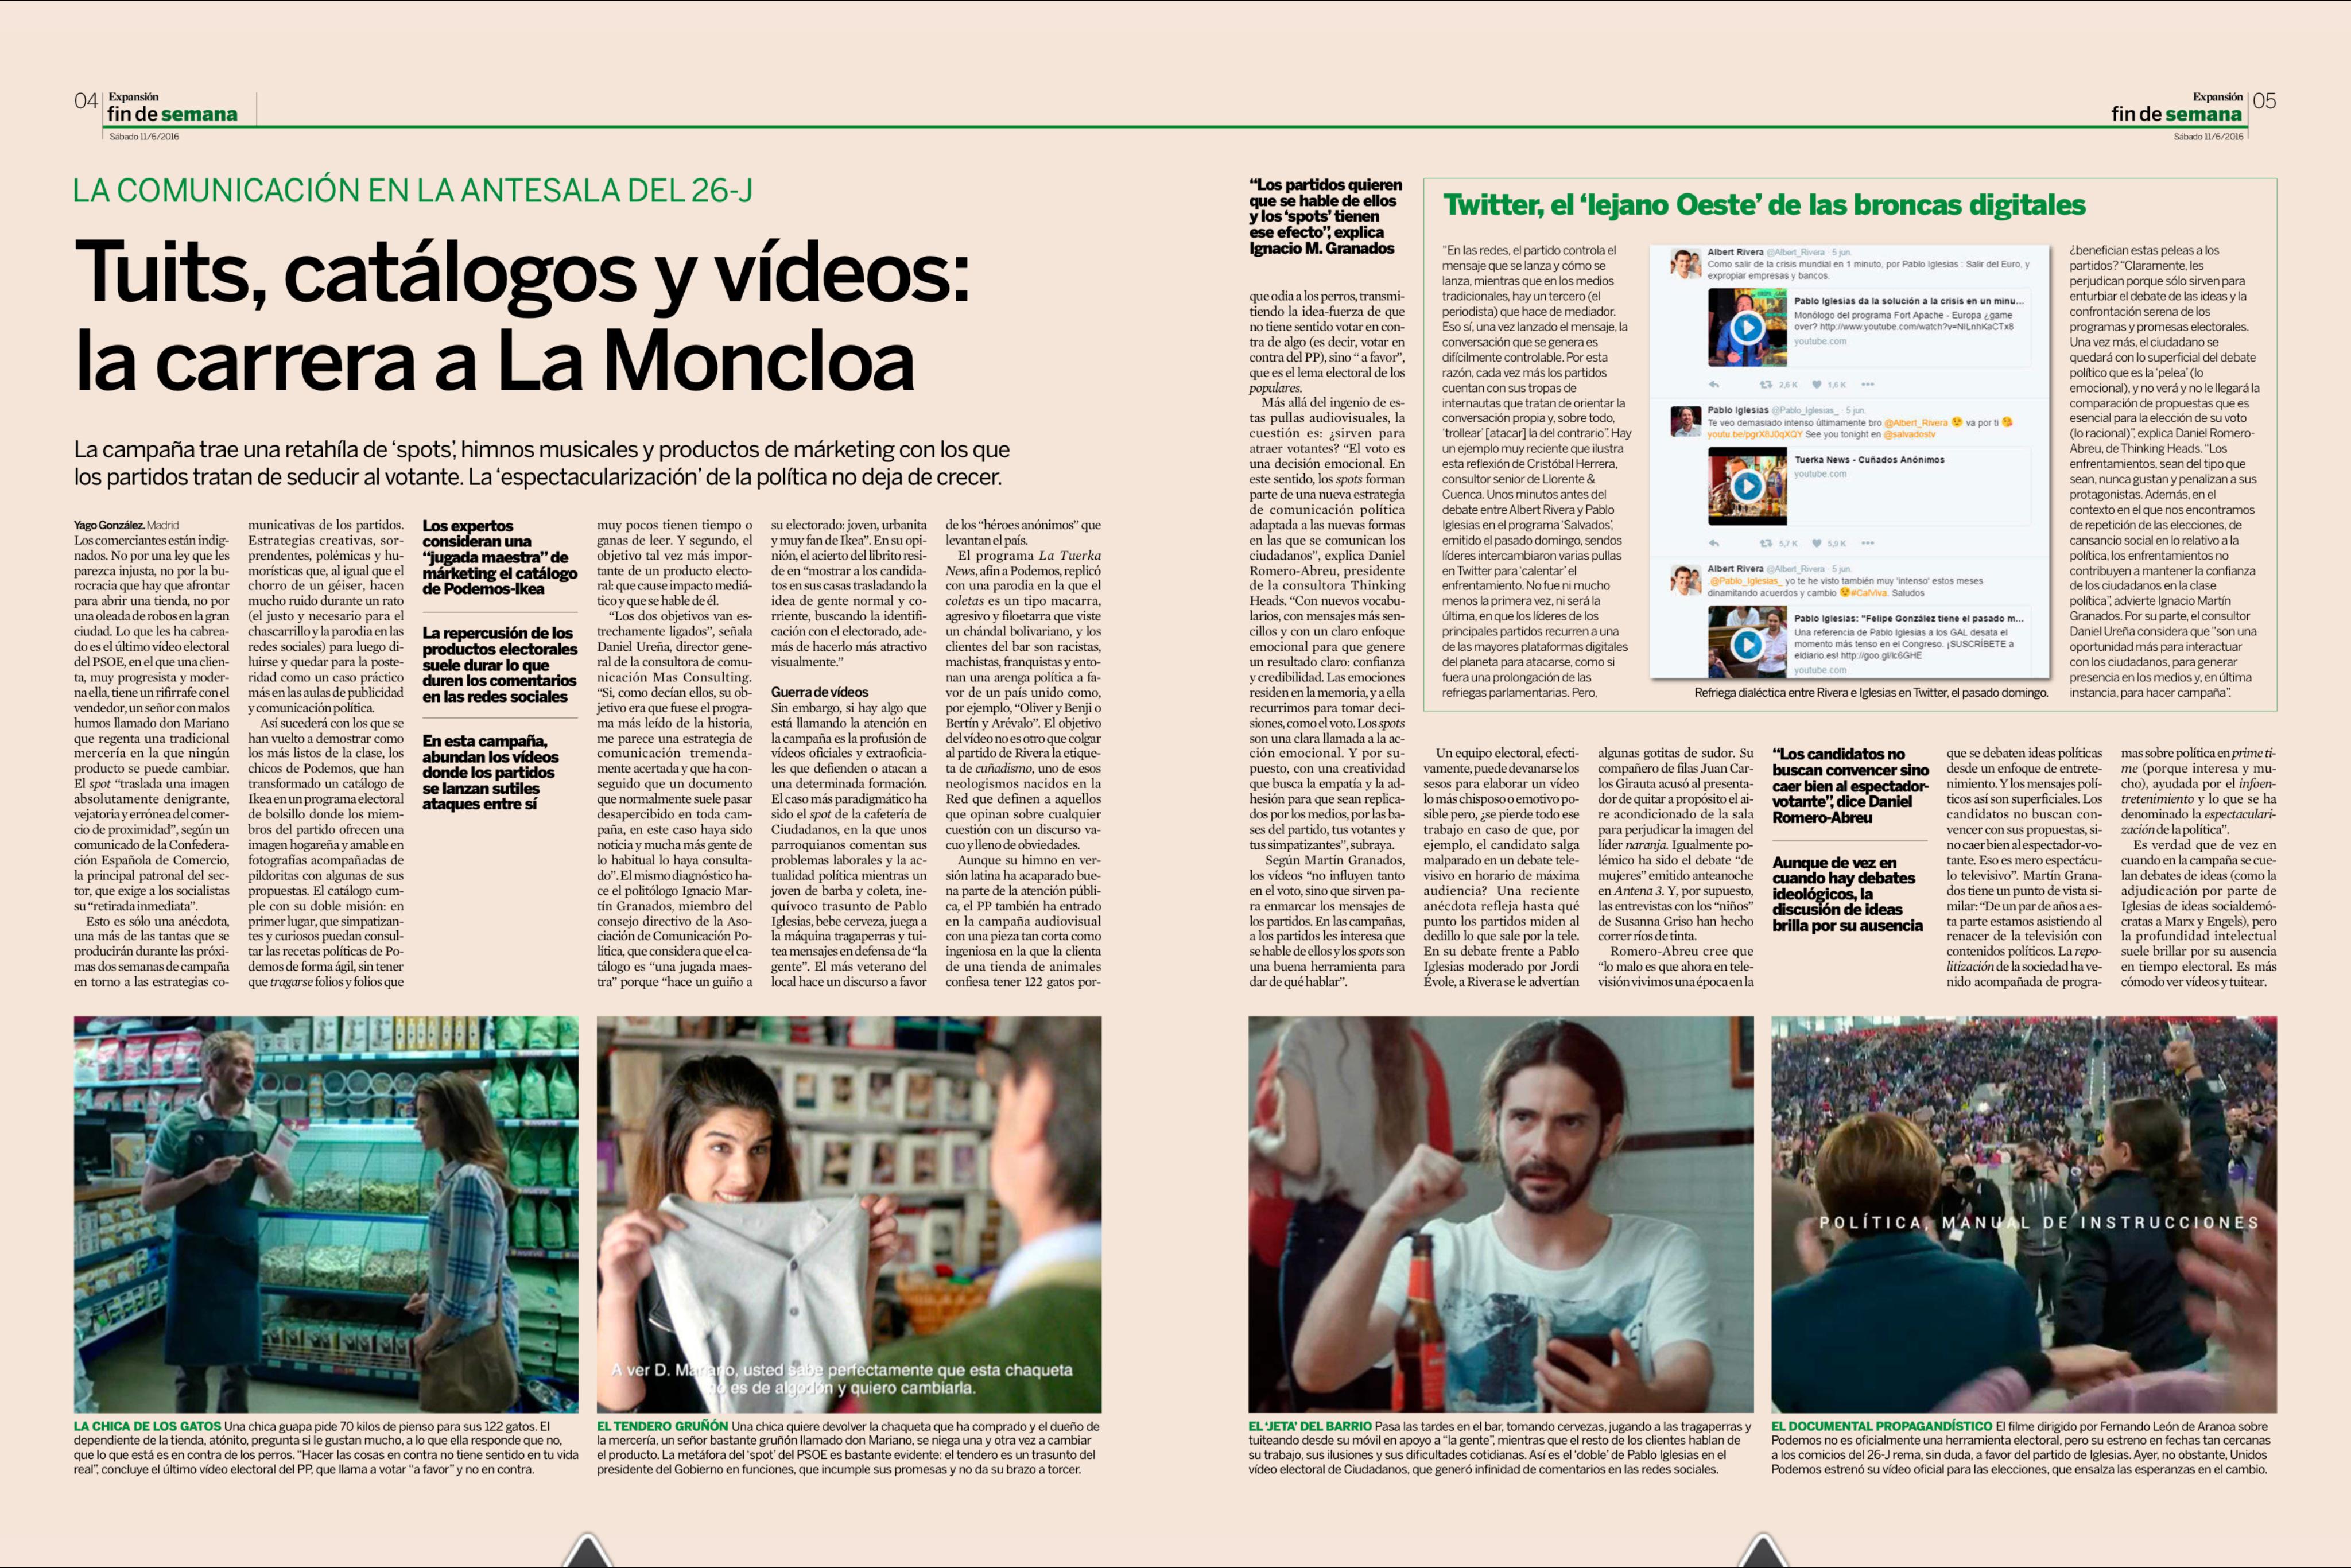 Tuits, catálogos y vídeos: la carrera a La Moncloa